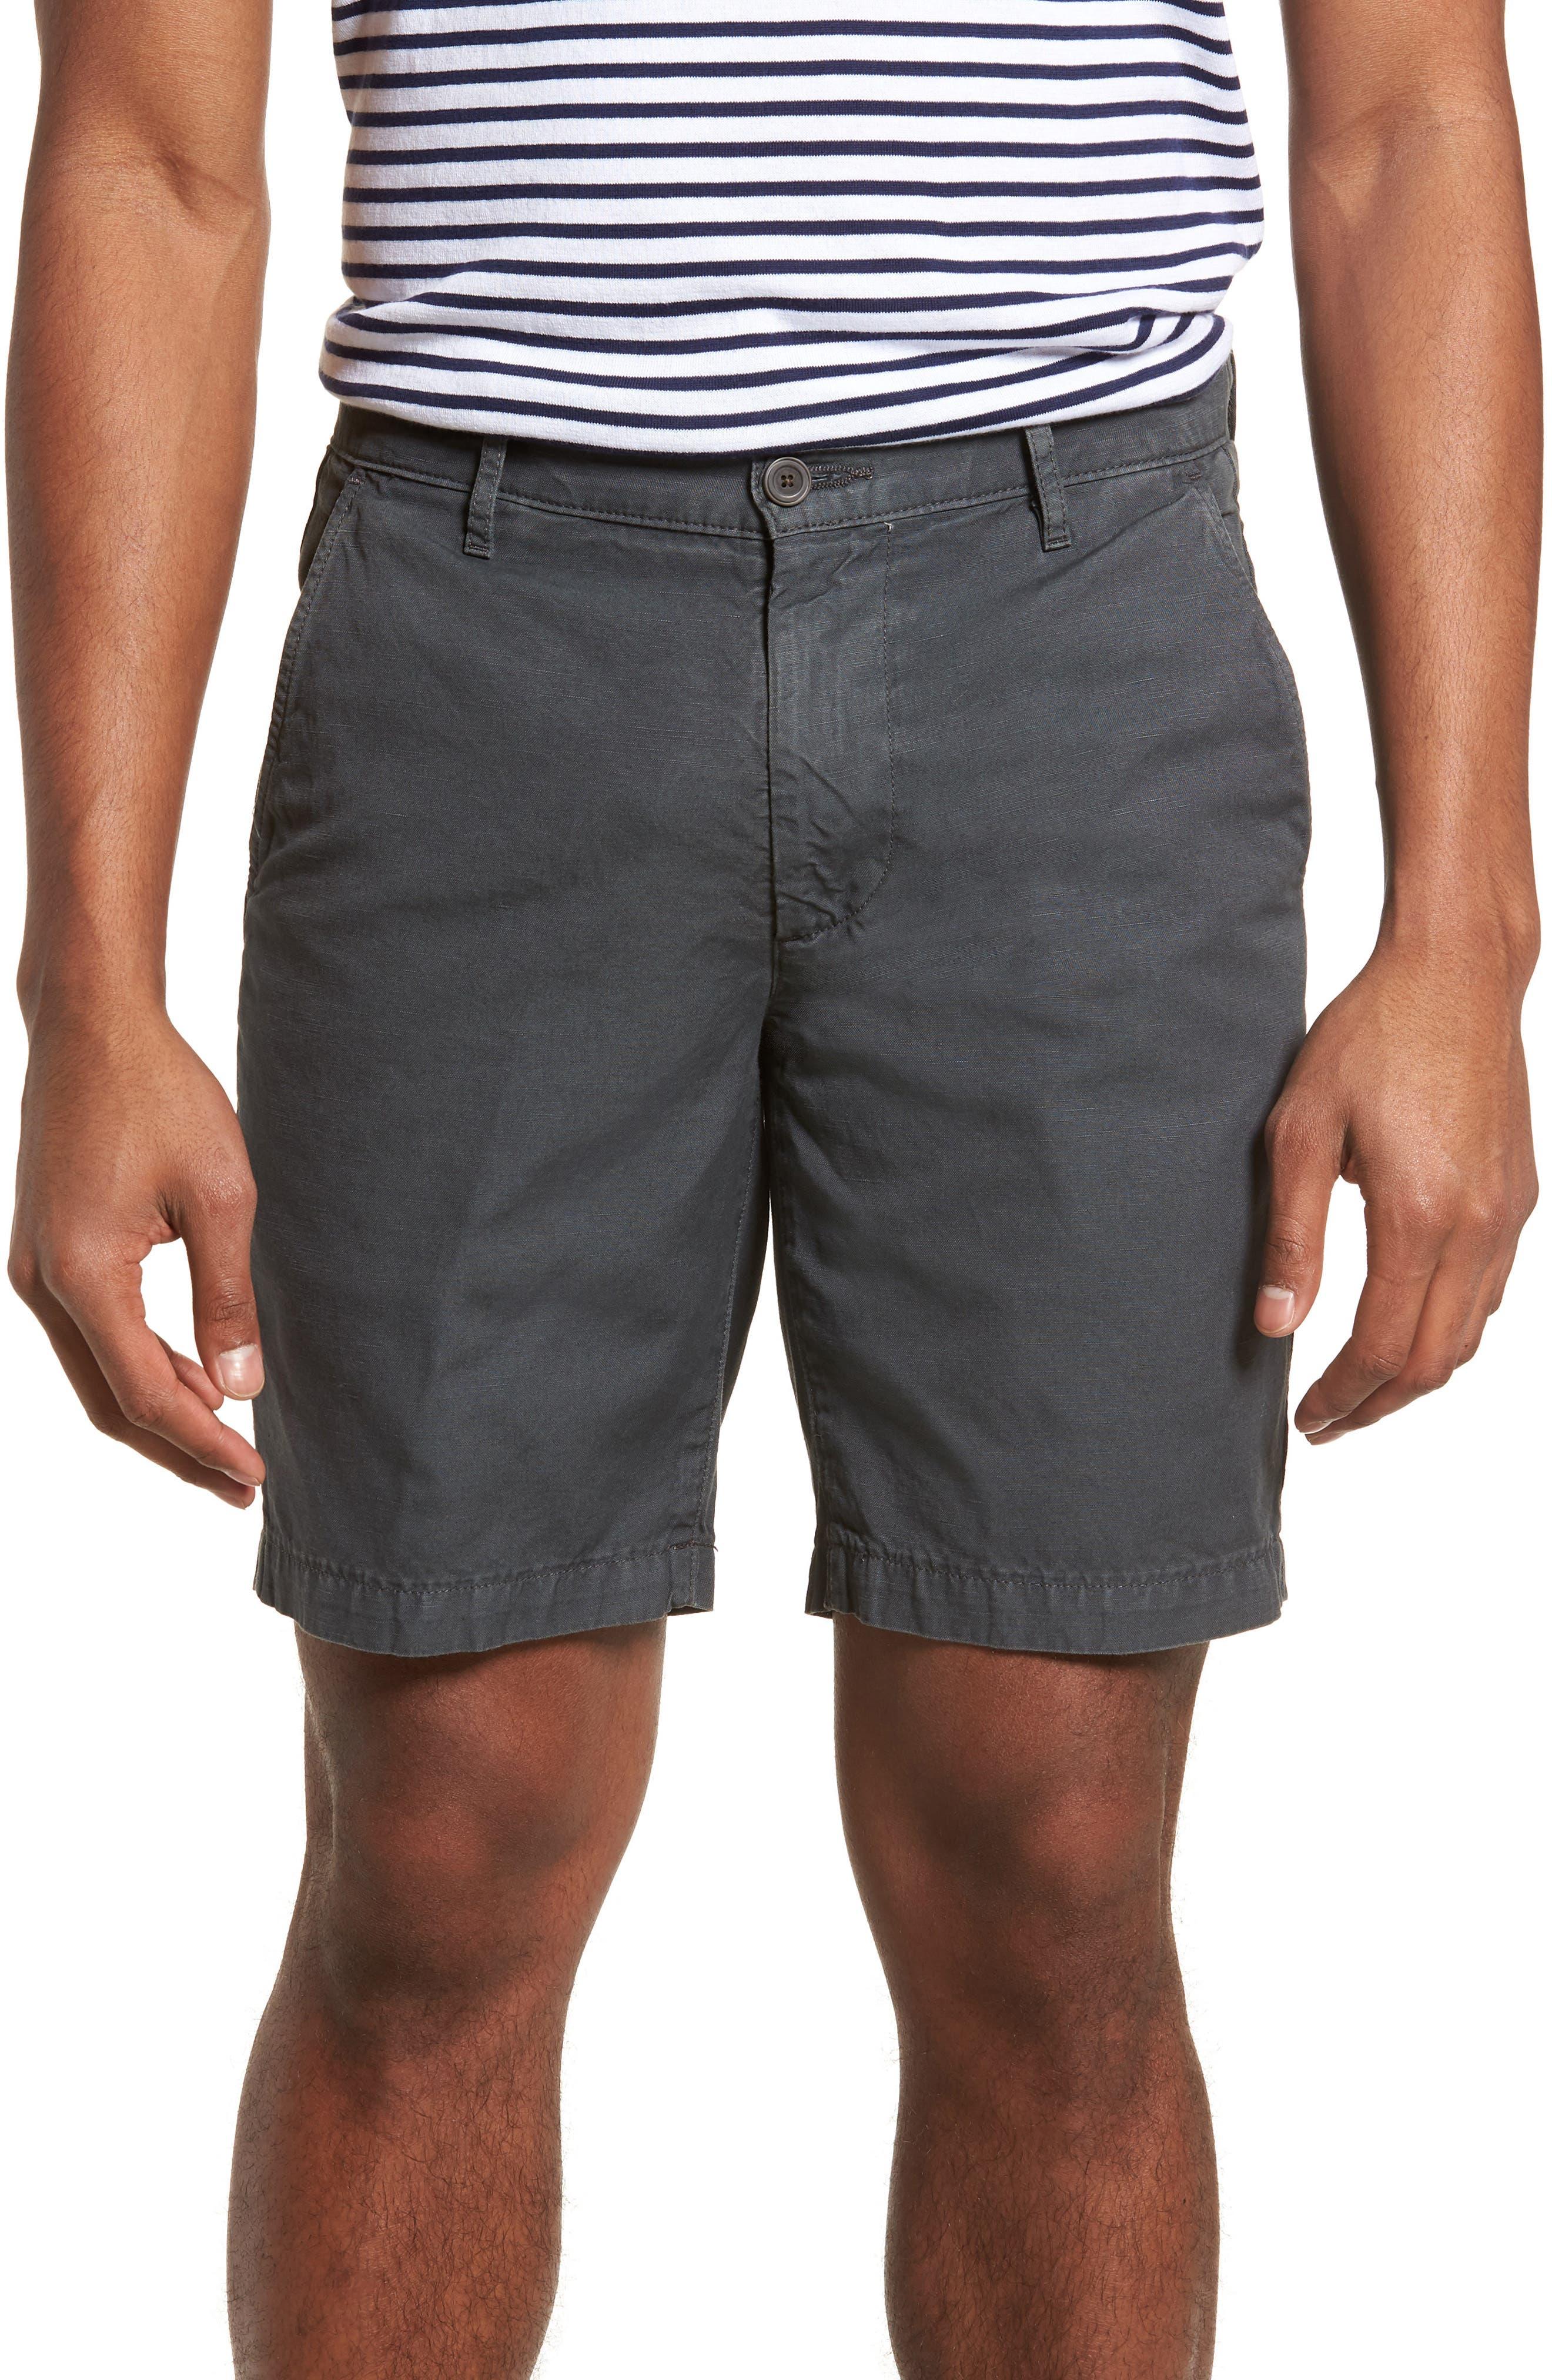 Wanderer Slim Fit Cotton & Linen Shorts,                             Main thumbnail 1, color,                             SULFUR SMOKE GREY